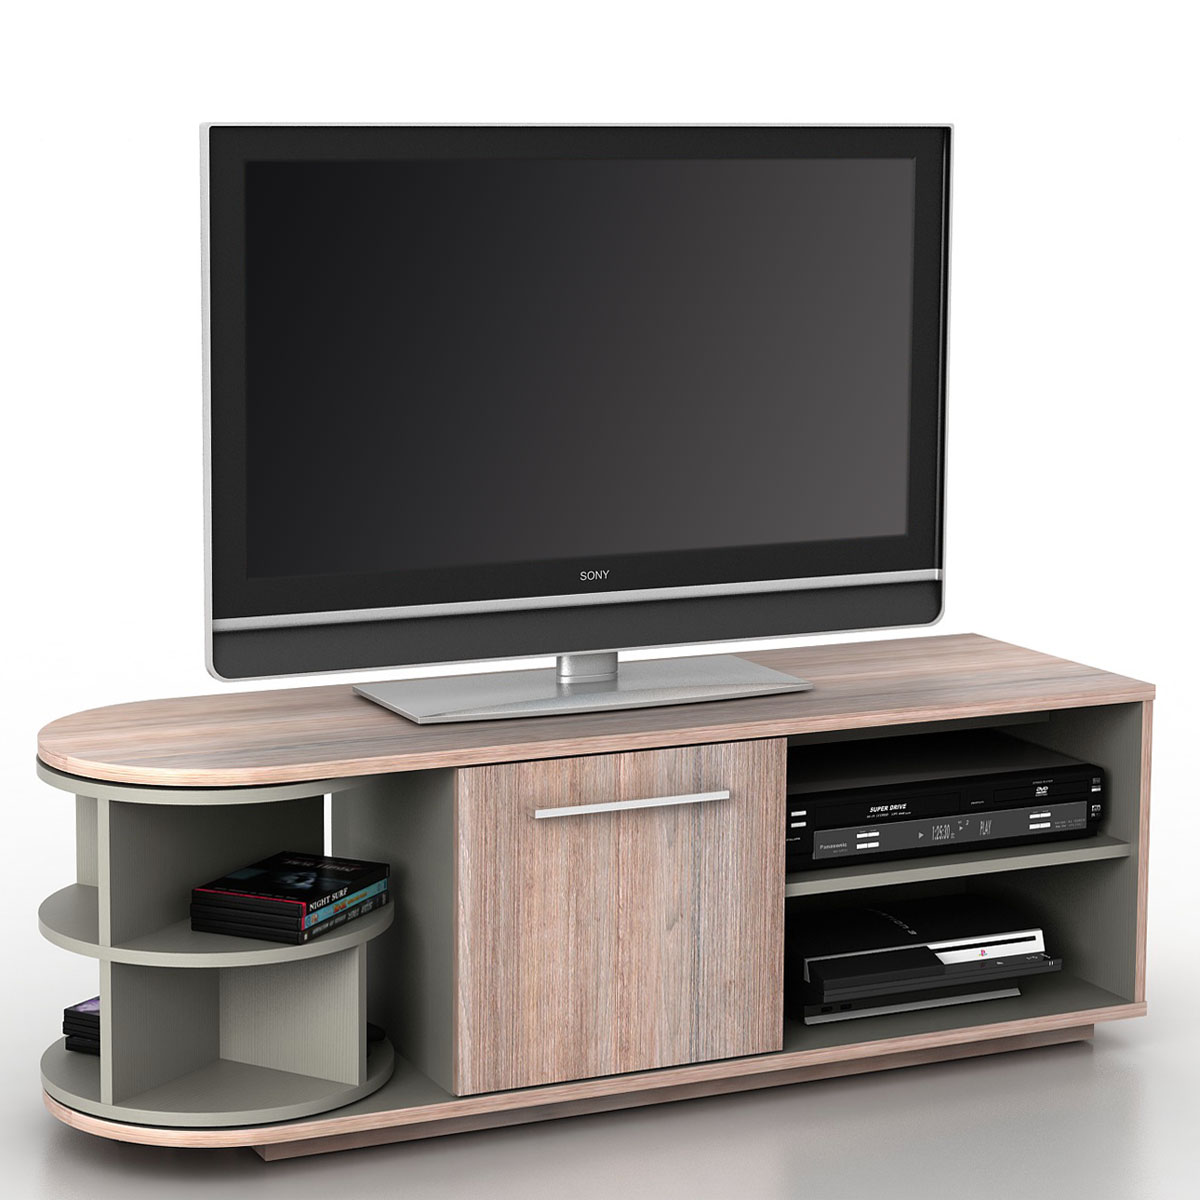 tv lowboard arau tv rack fernsehtisch mit drehelement 120x45x40cm eiche optik 3d struktur. Black Bedroom Furniture Sets. Home Design Ideas